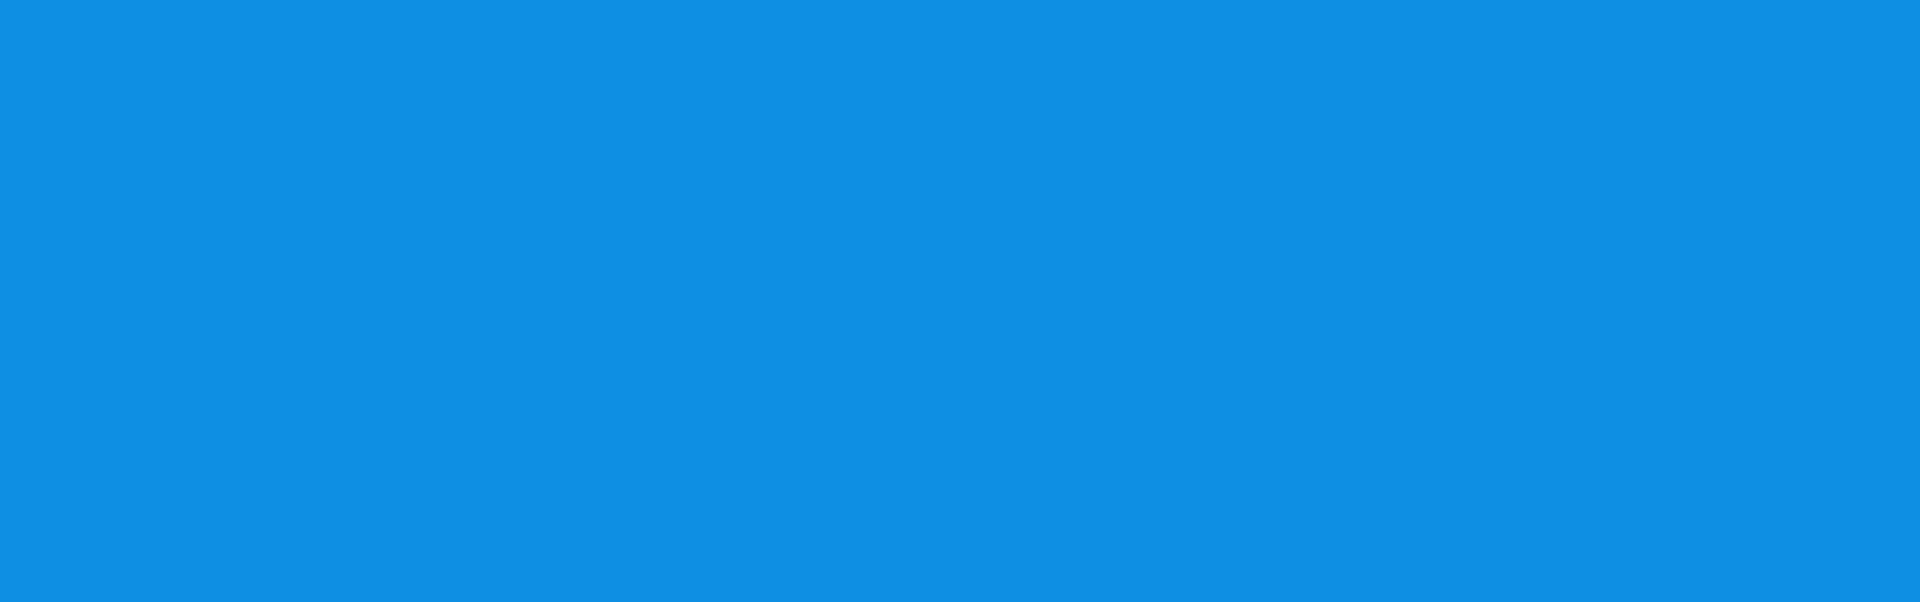 appmyil bg shape